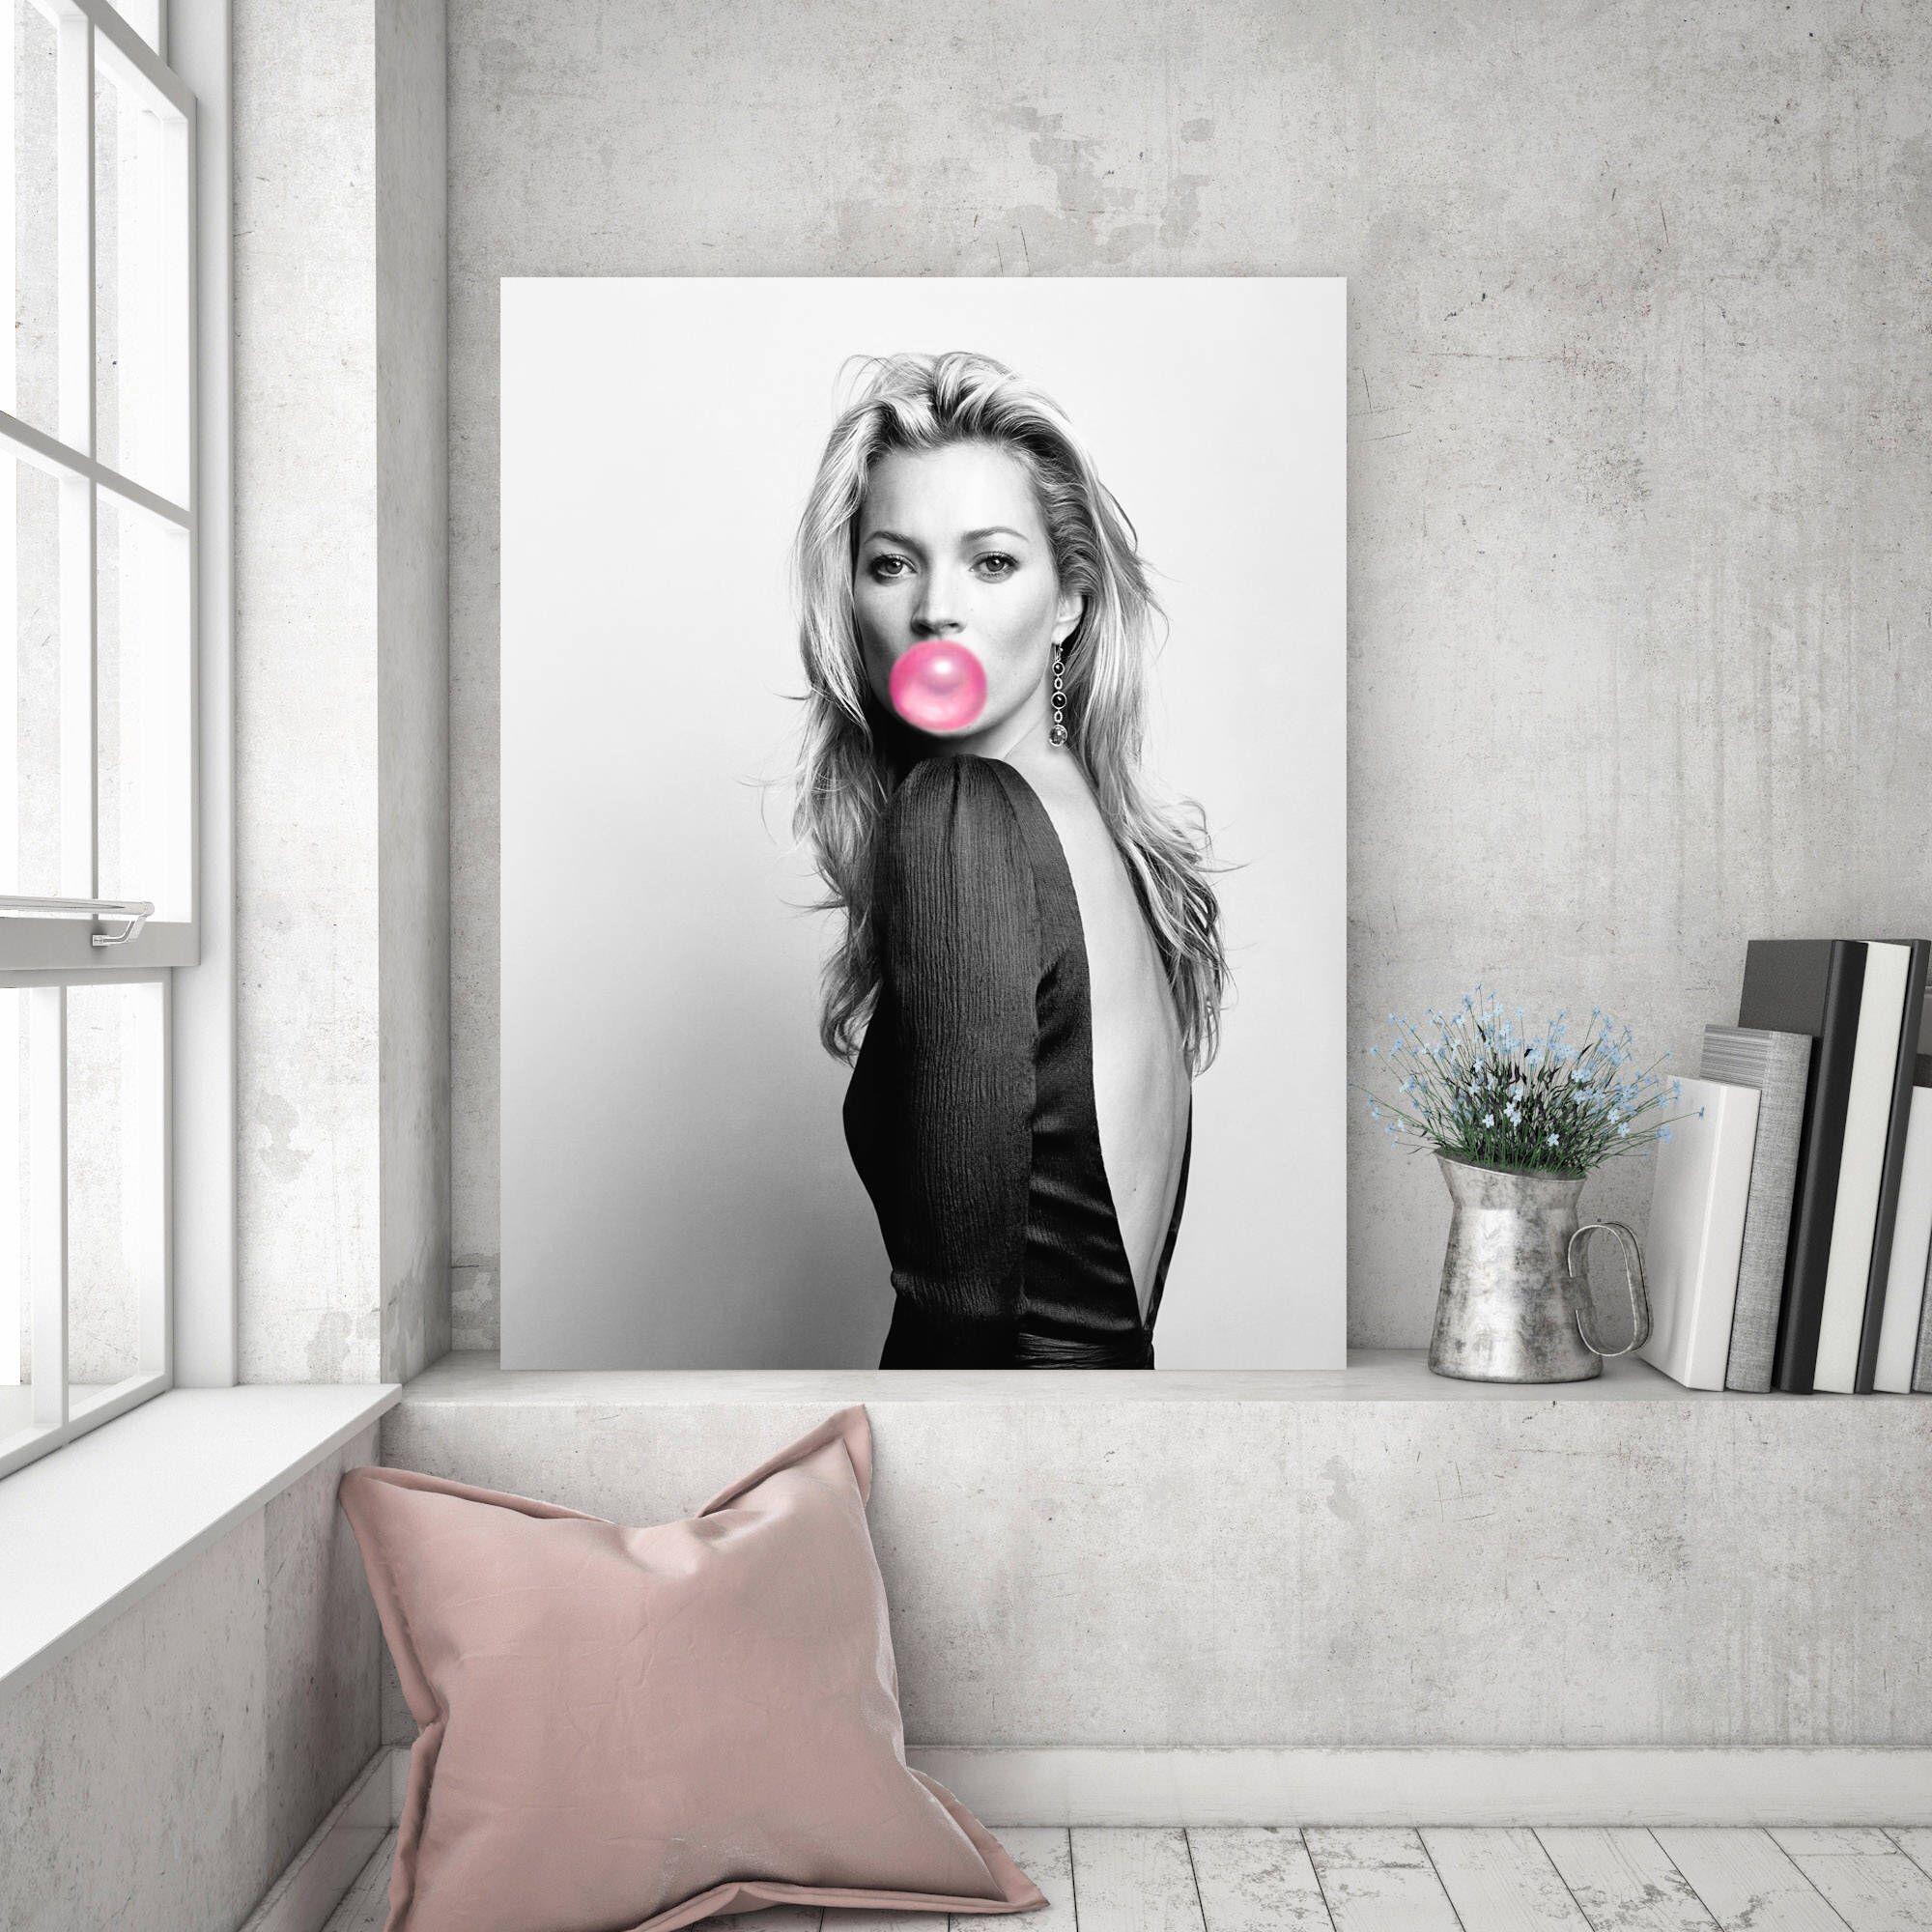 CANVAS Kate Moss Print Art POSTER